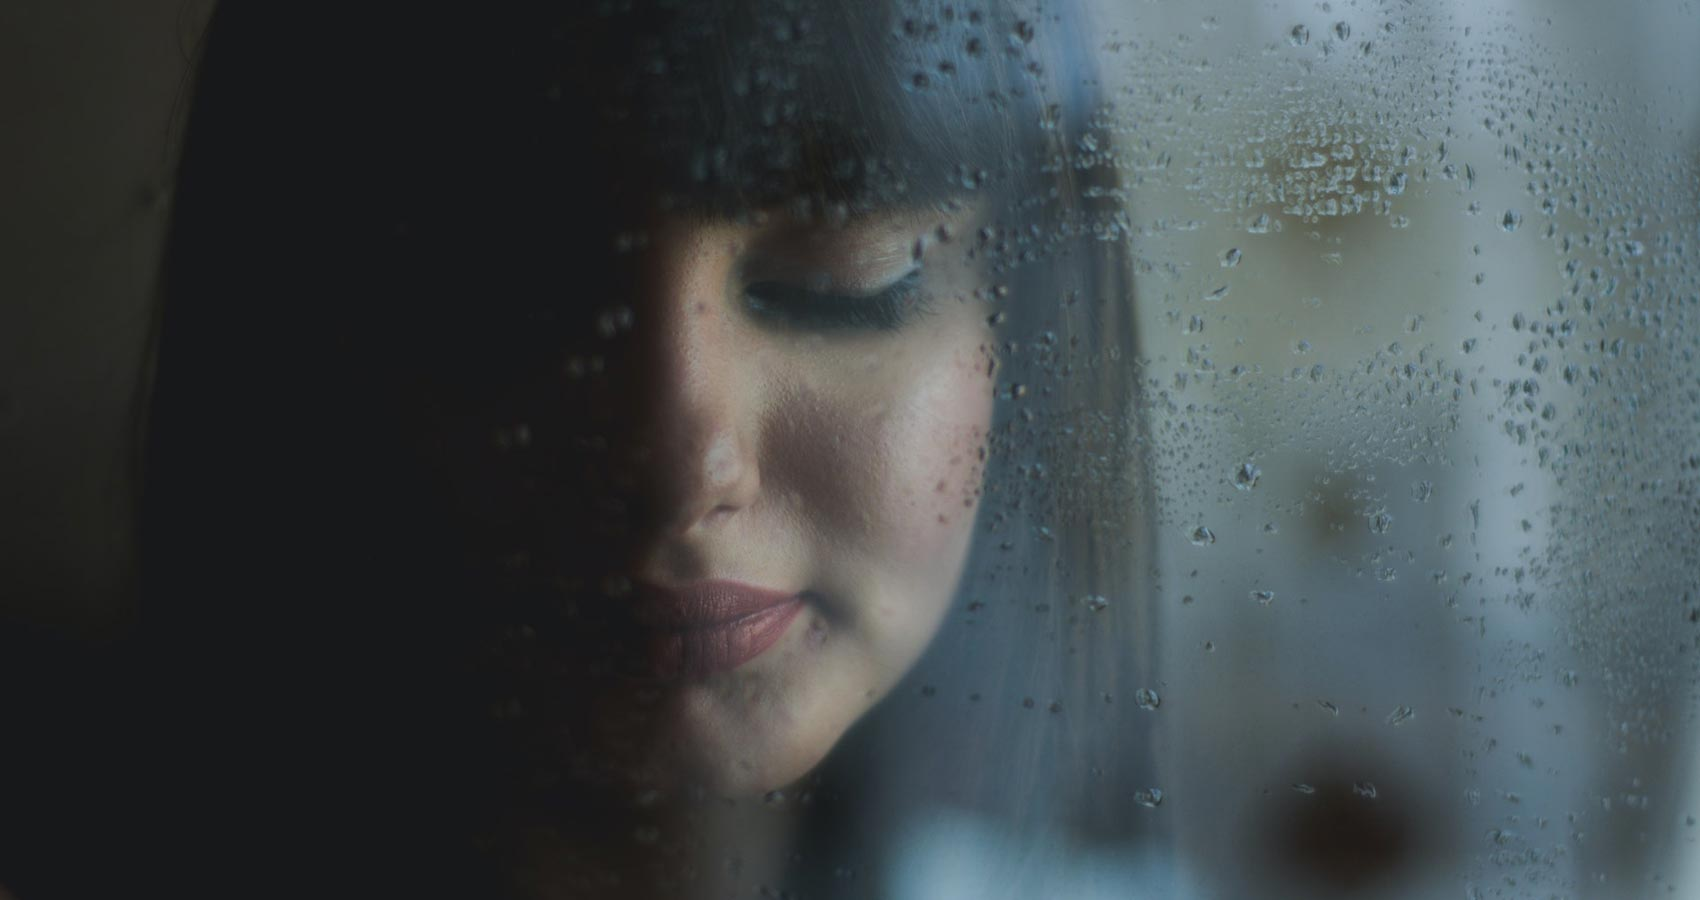 Rainy Days, poetry written by Satabdi Saha at Spillwords.com